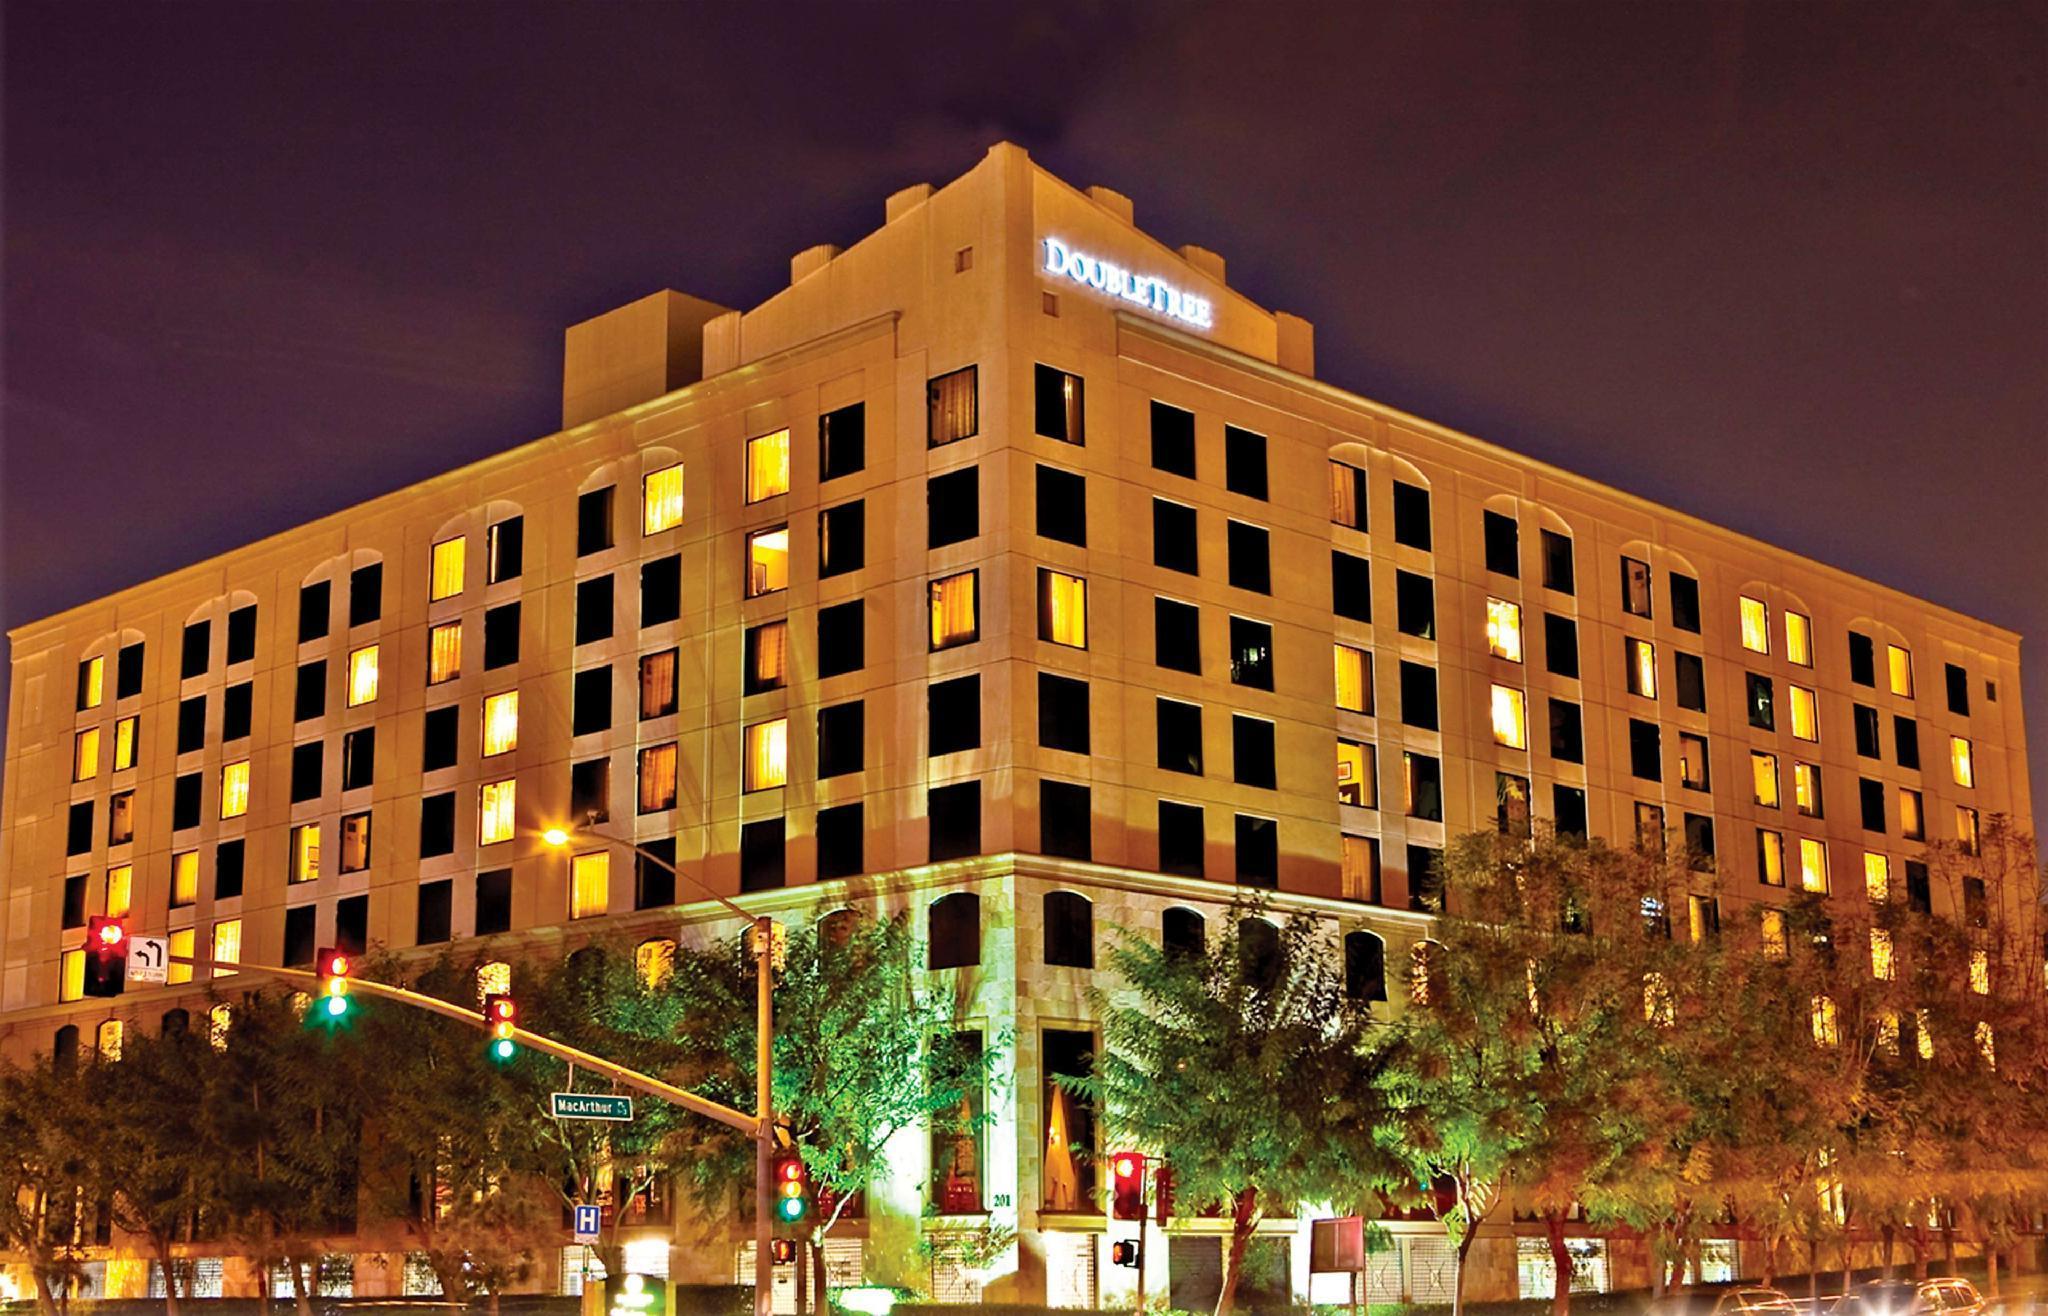 Doubletree Santa Ana Orange County Airport Hotel